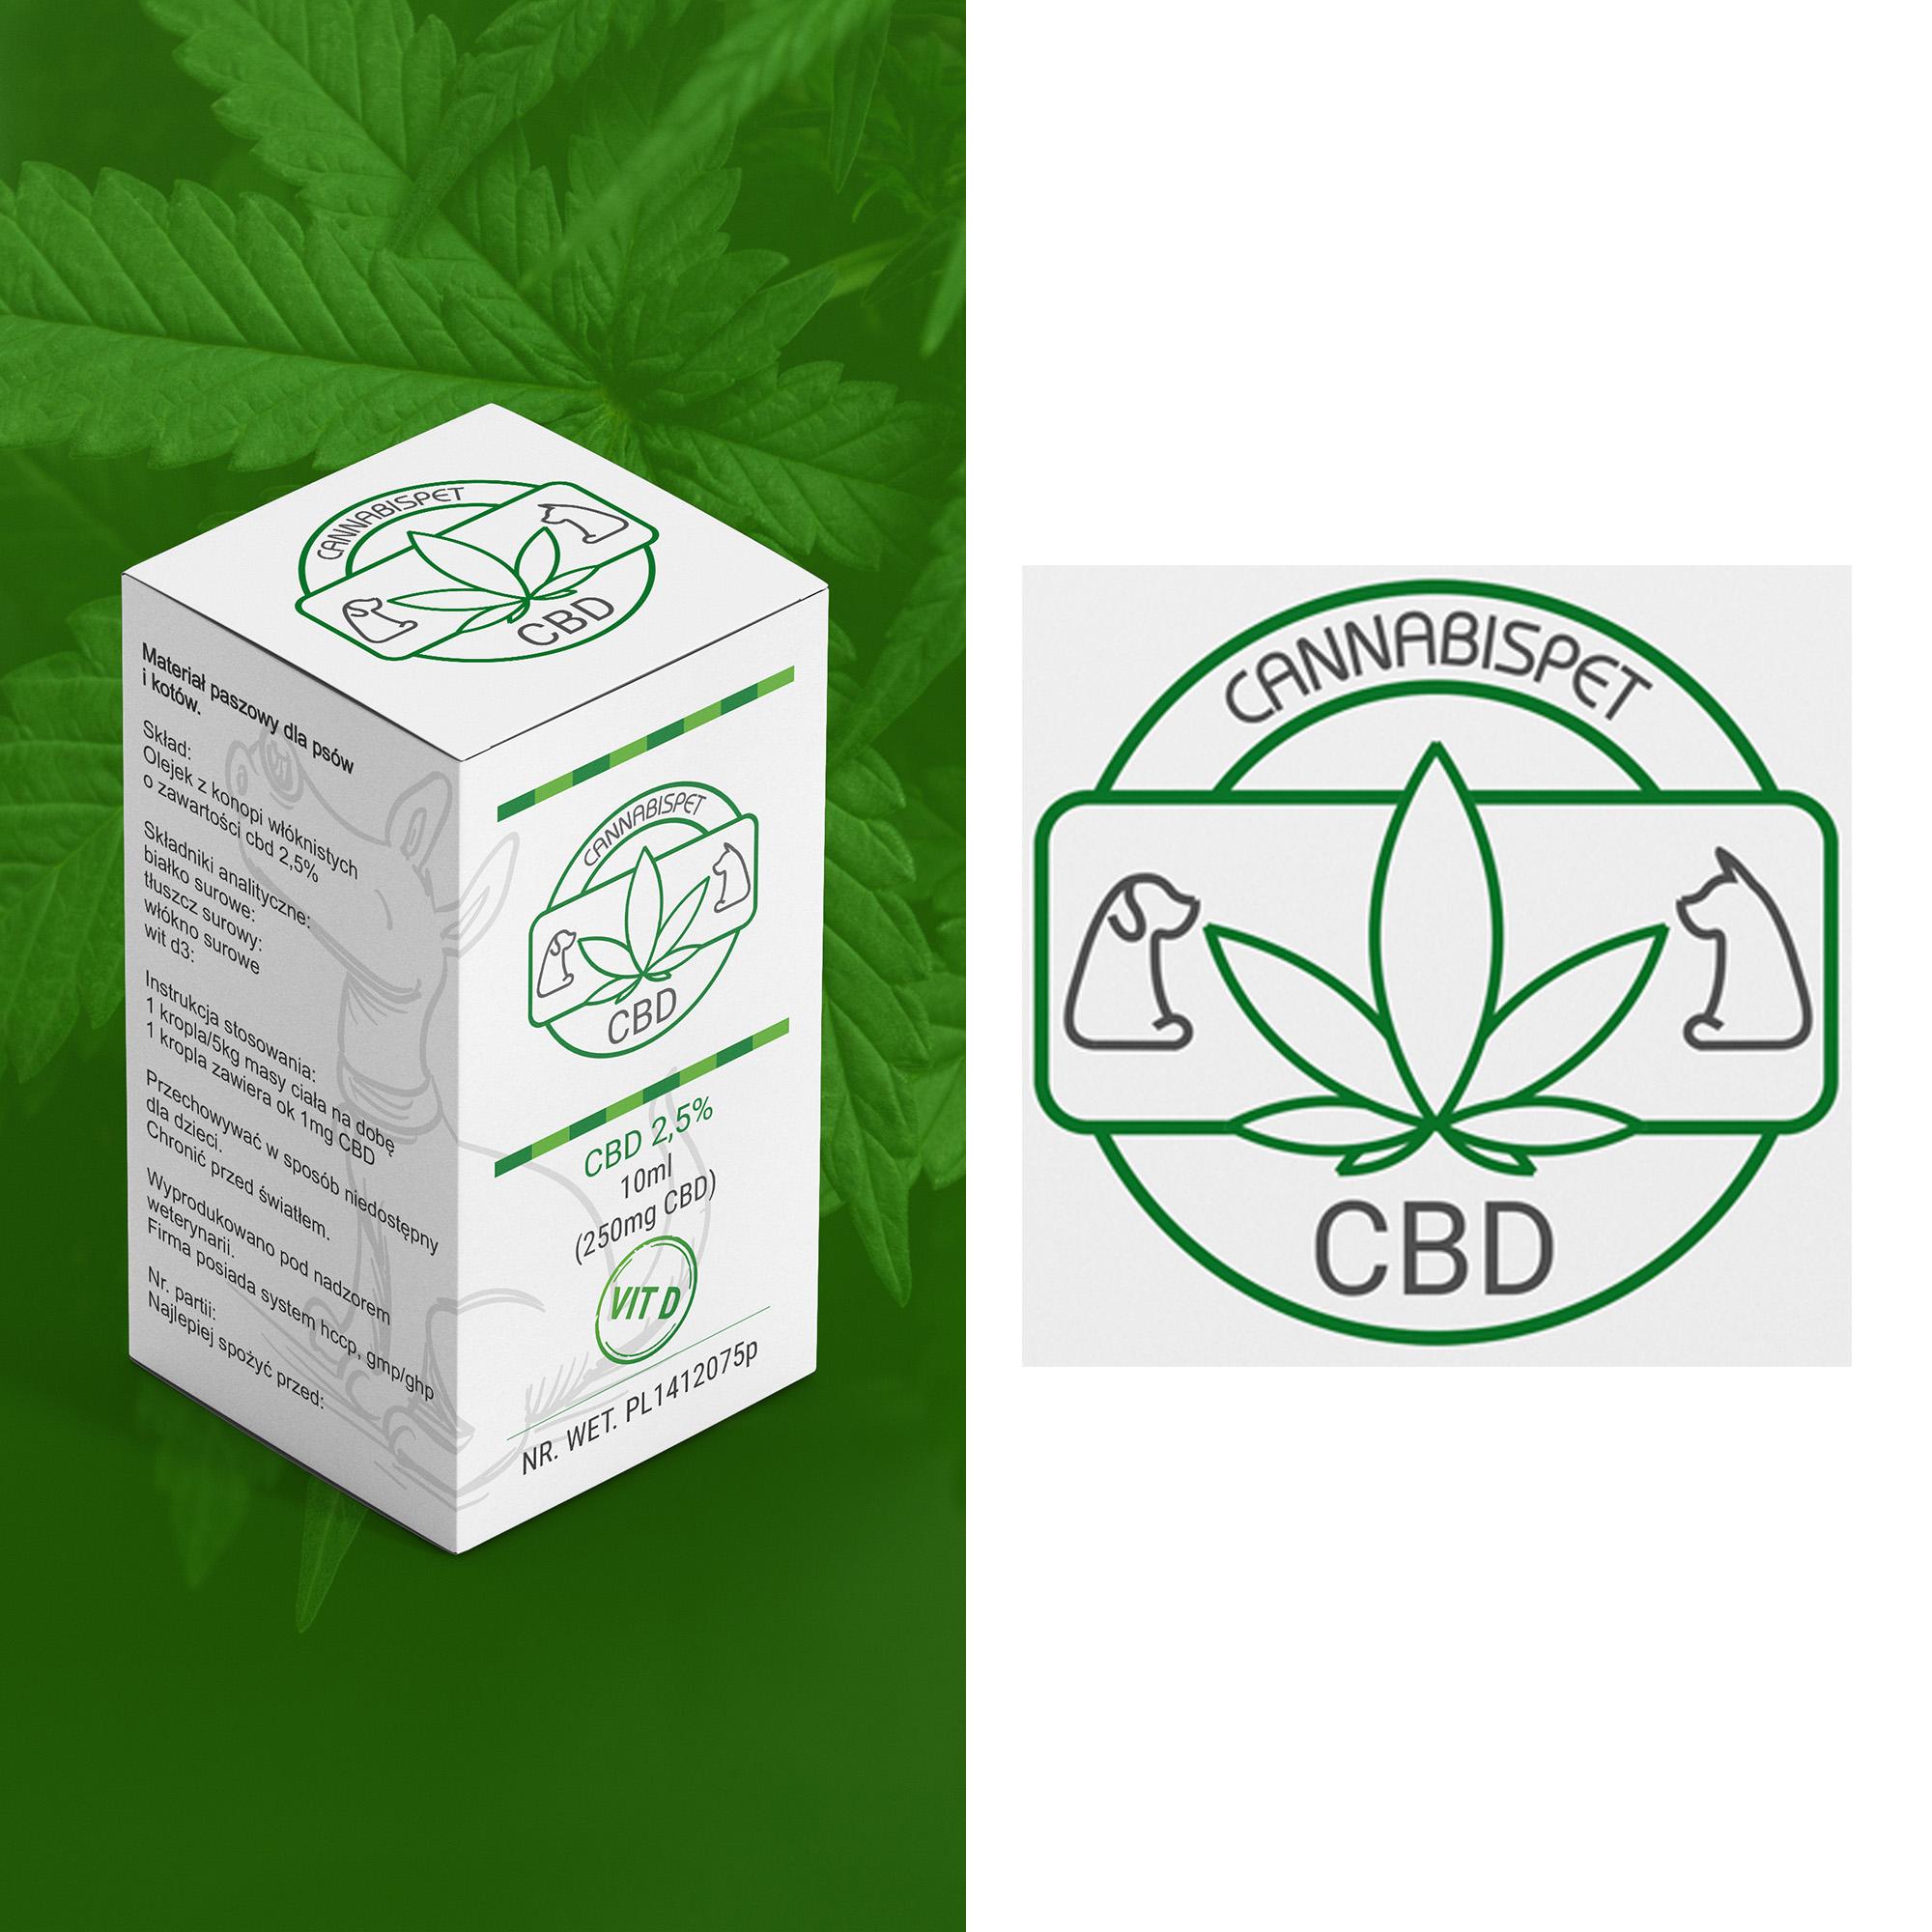 Cannabispet